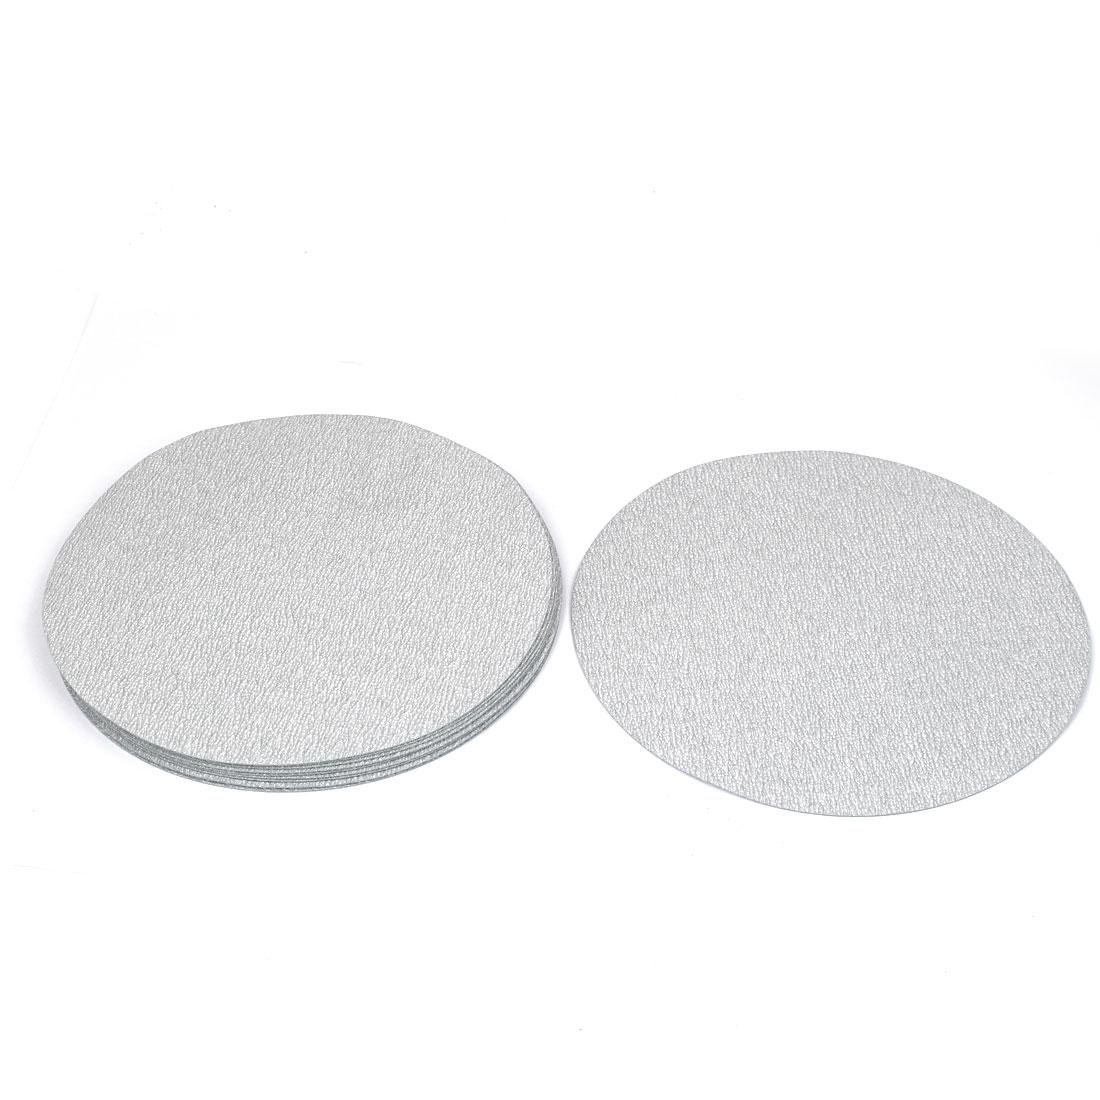 "7"" Dia Polishing Round Dry Abrasive Sanding Sandpaper Sheet Disc 600 Grit 10 Pcs"